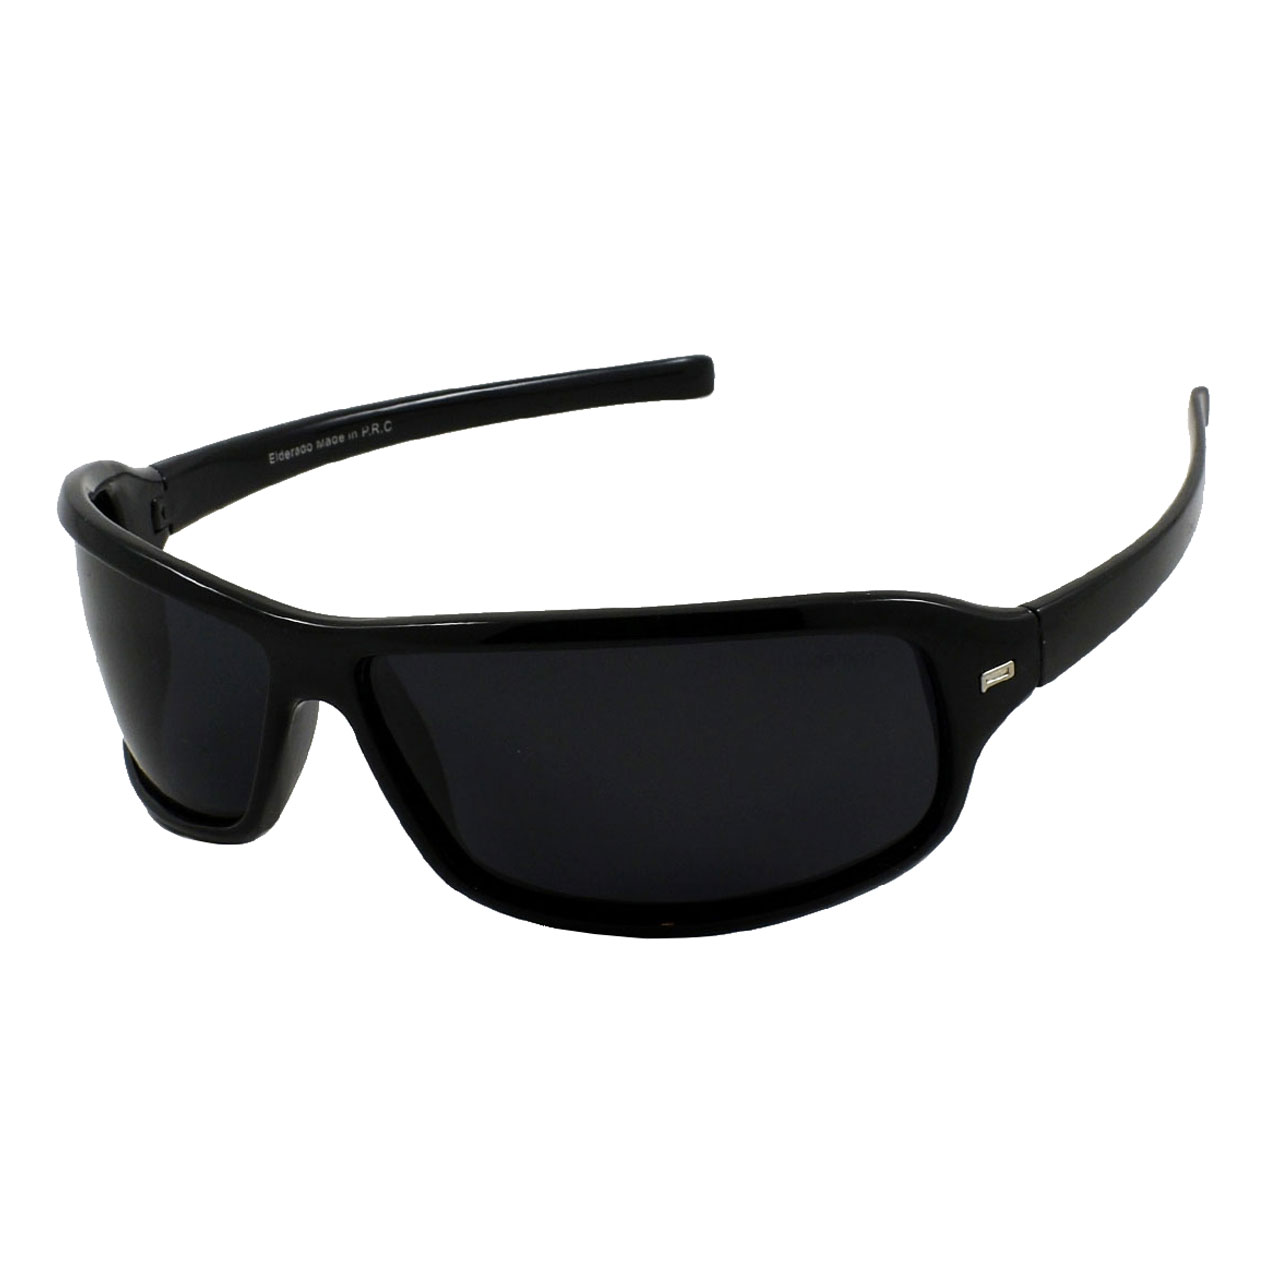 قیمت عینک آفتابی الدرادو مدل Smooth Edge Sharp